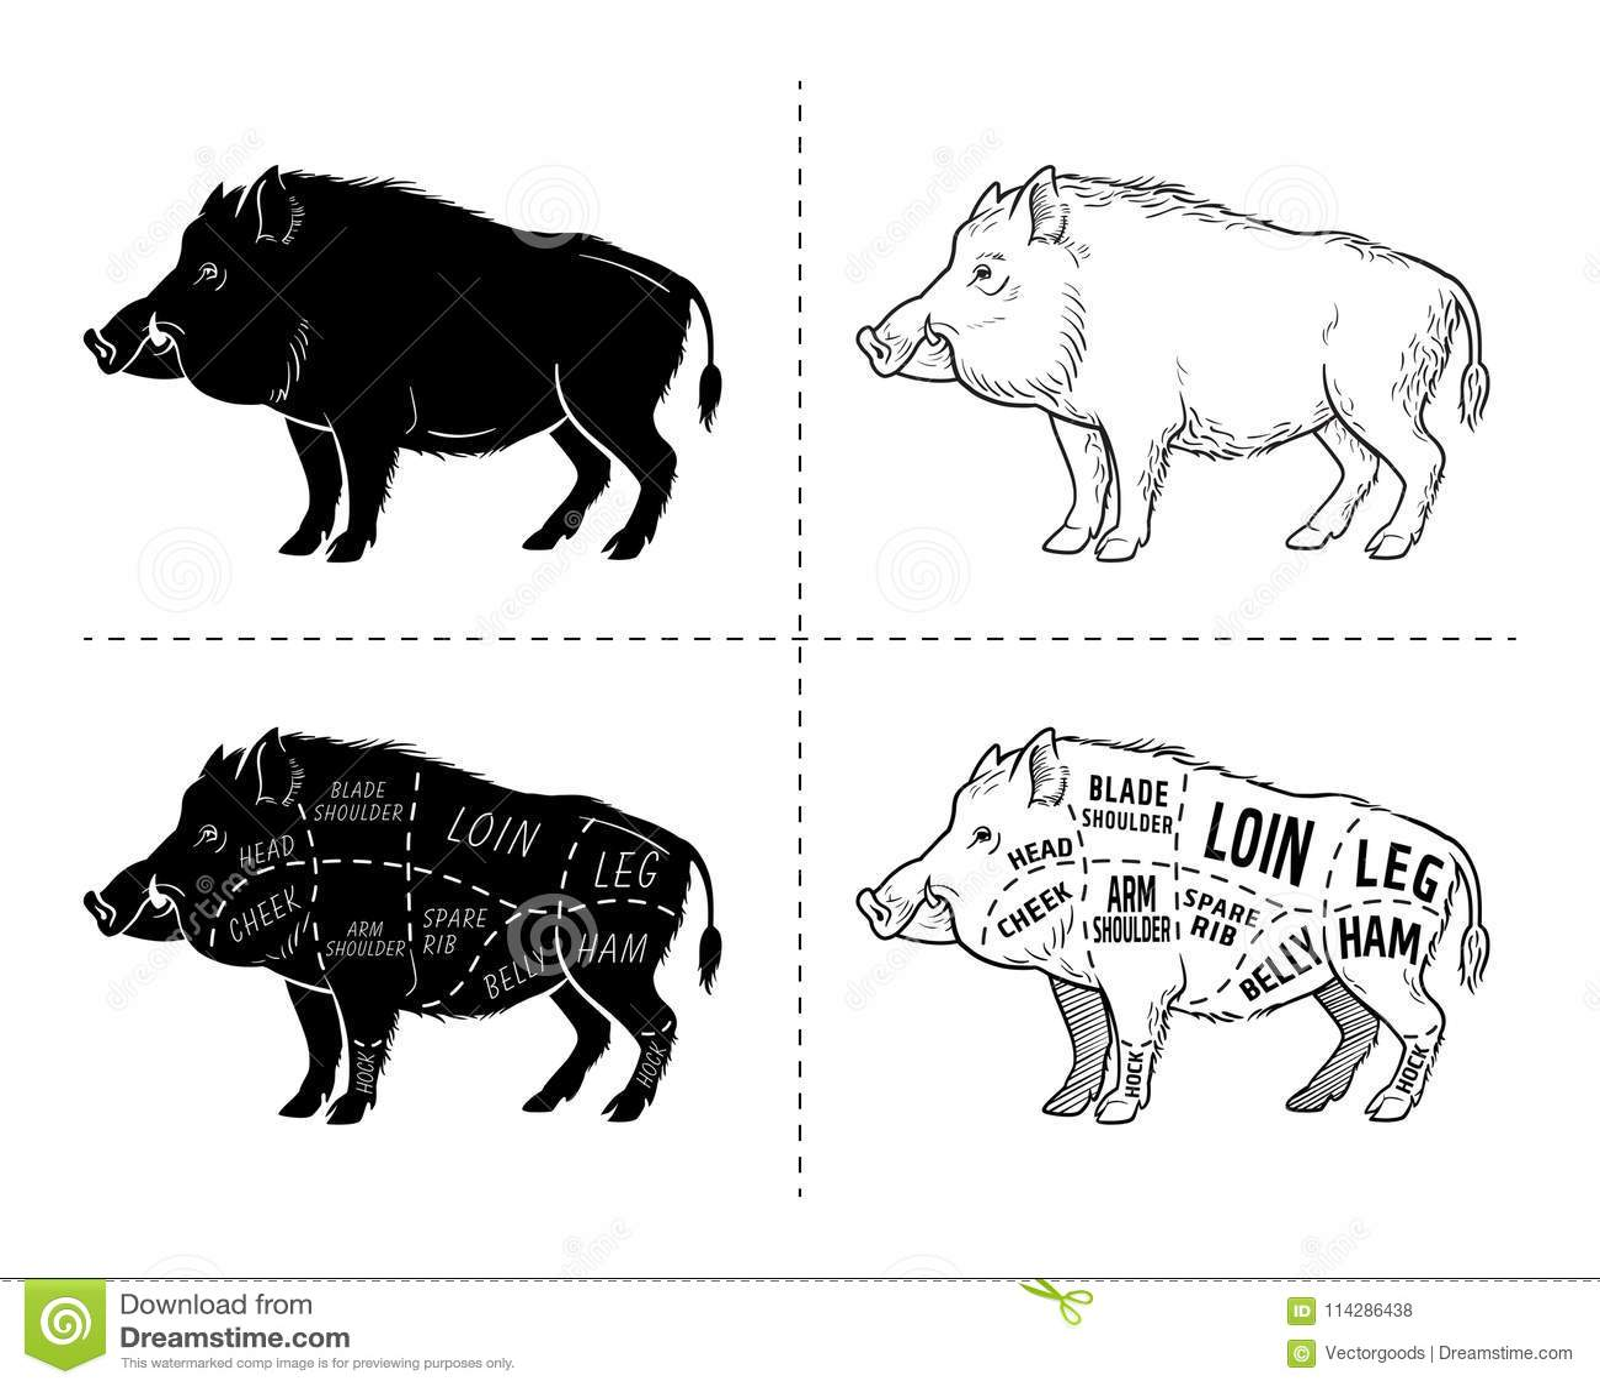 hight resolution of wild hog boar game meat cut diagram scheme elements set on wild boar meat cuts diagram logo